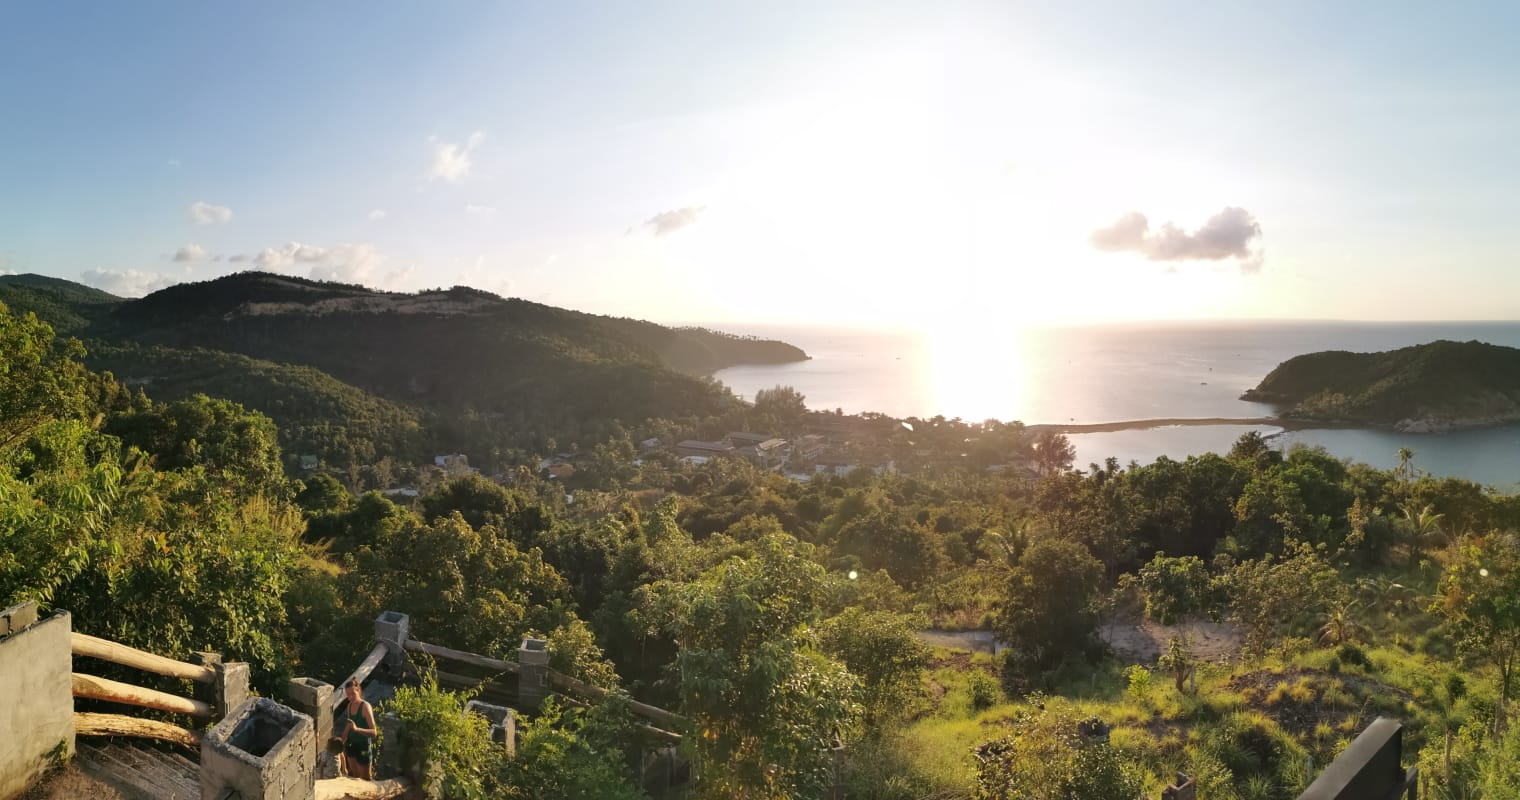 Ausflugstipp Koh Phangan: Viewponit der 360 Bar mit Blick auf die Insel Koh Ma